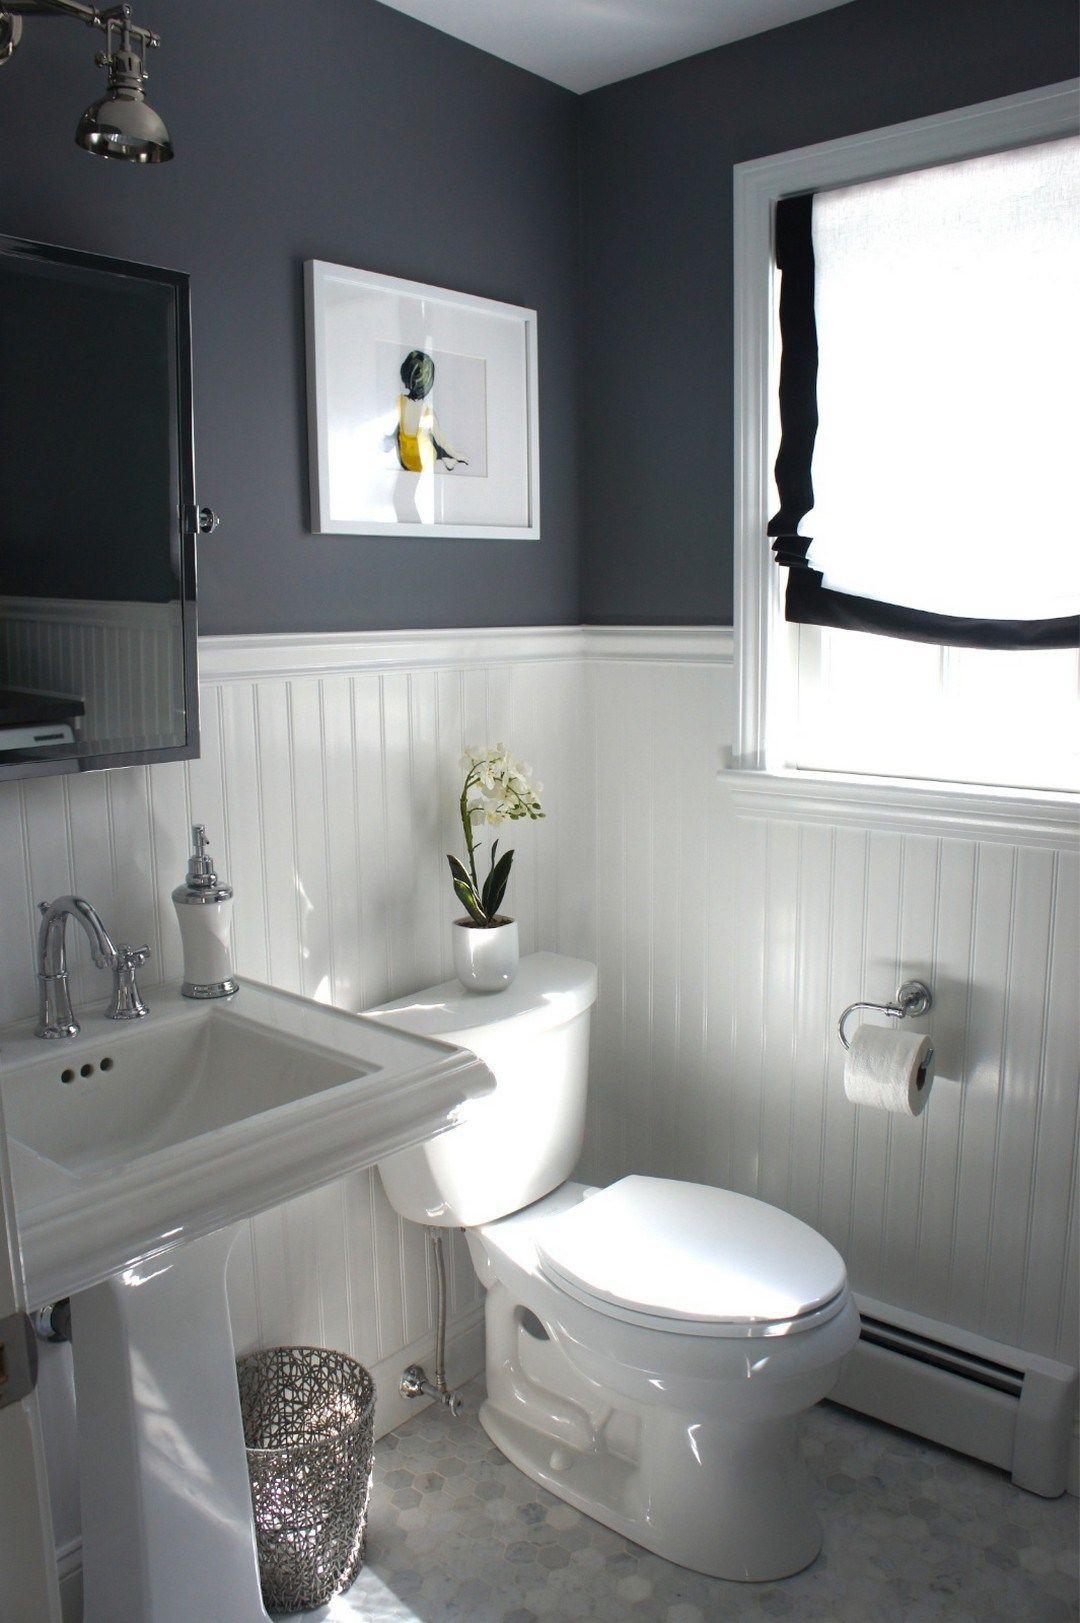 Ideas for small bathroom improvements on a budget CGPVLKQ